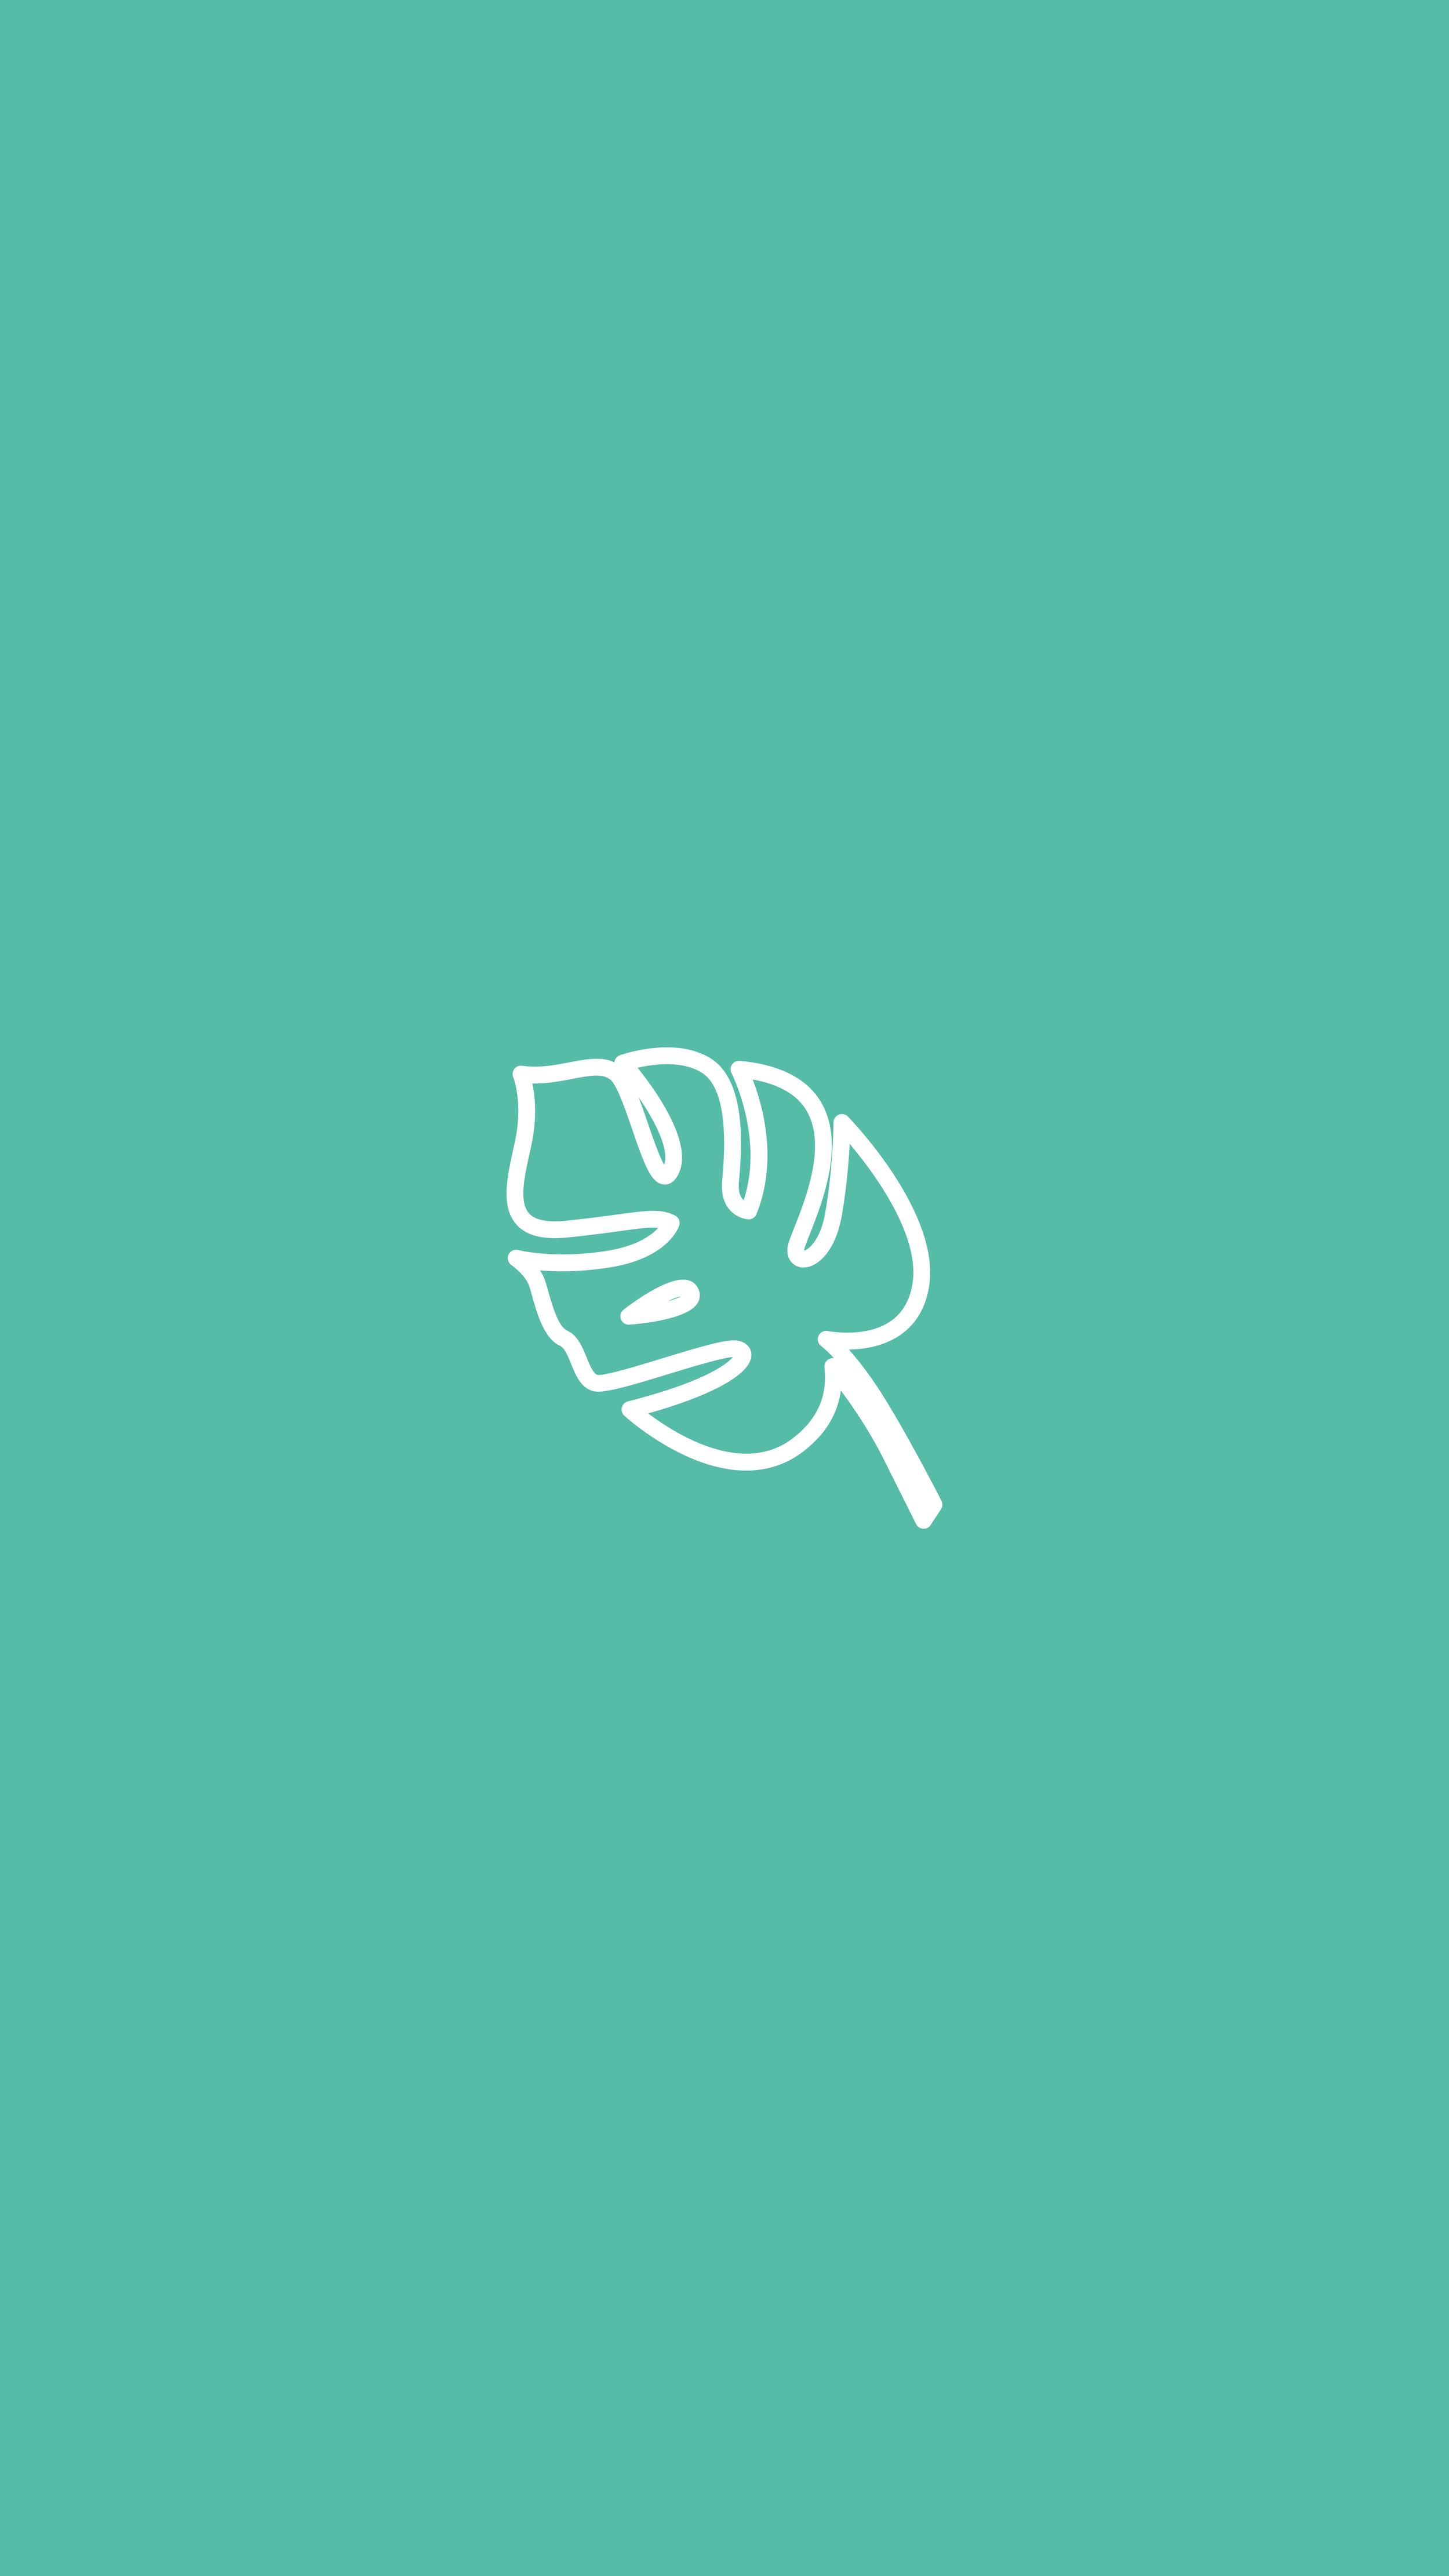 Monstera Leaf, Plant, House Plant